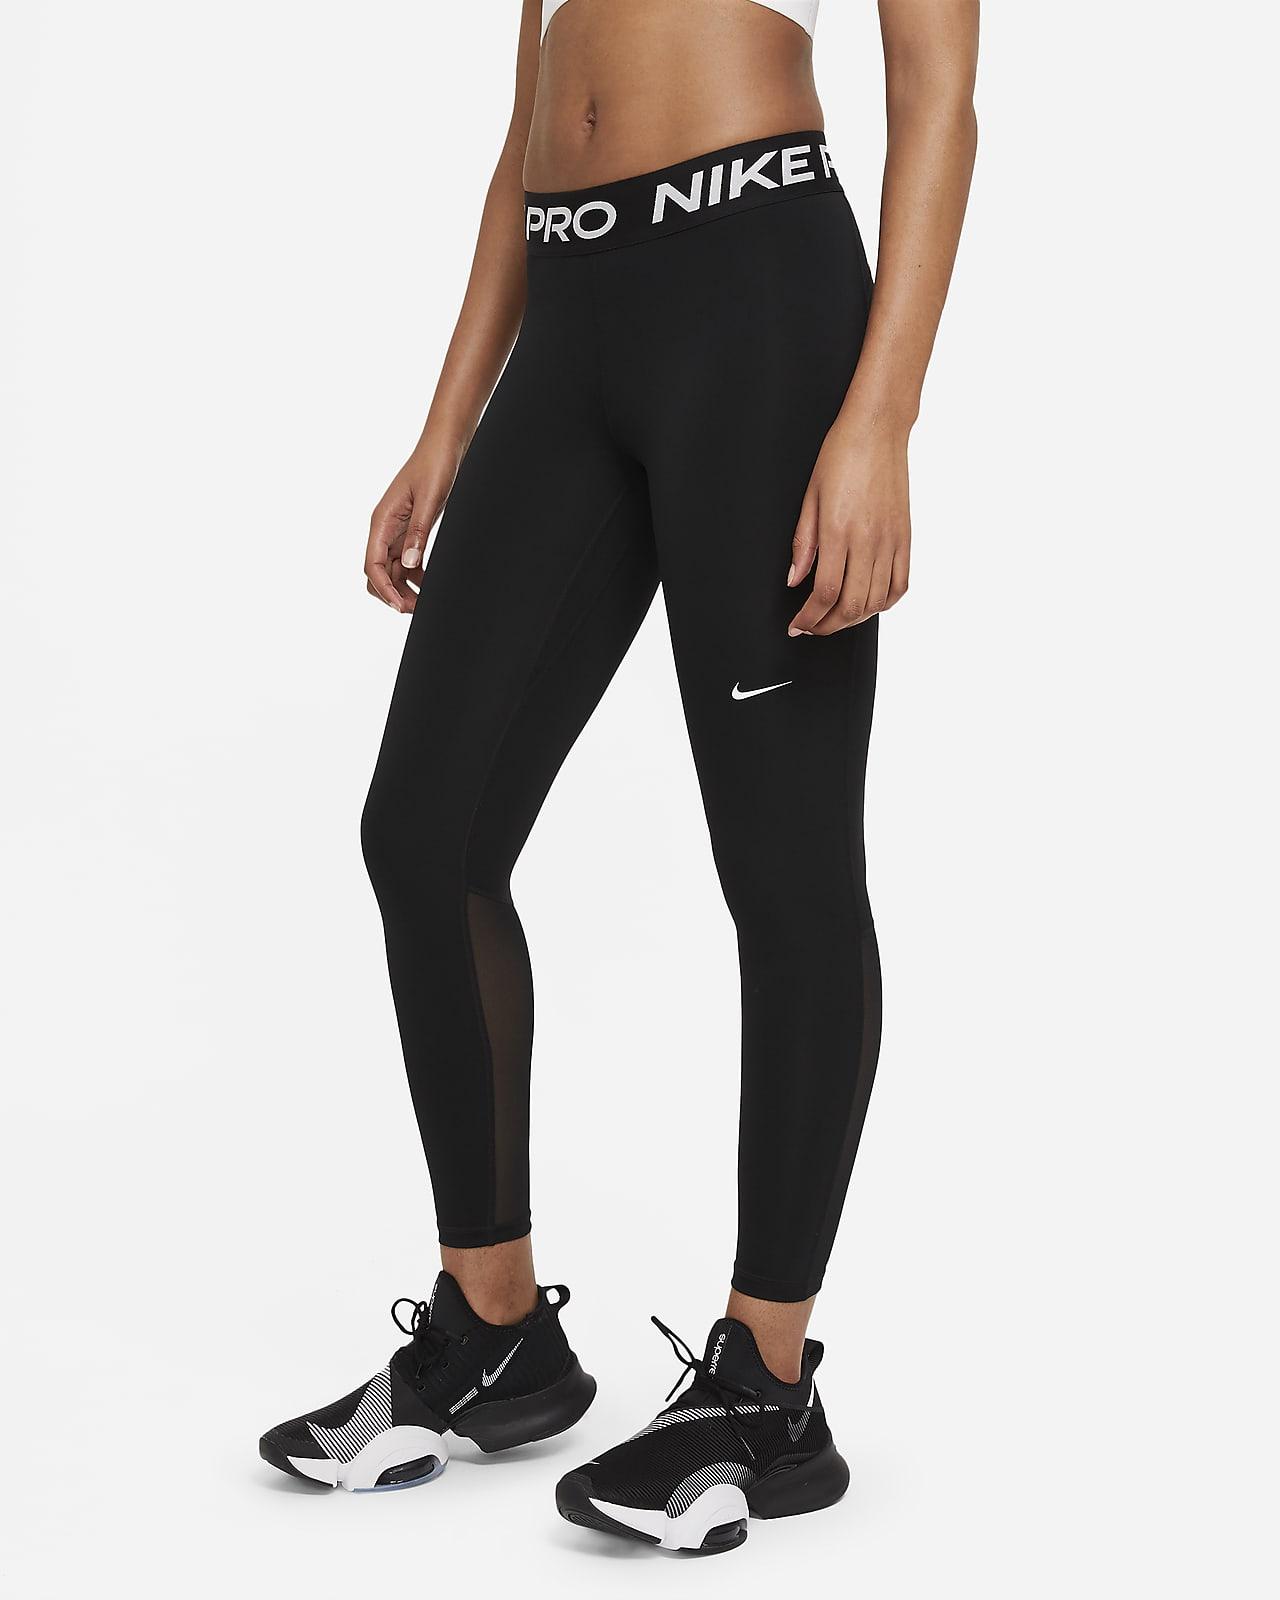 Nike Pro 女款中腰內搭褲